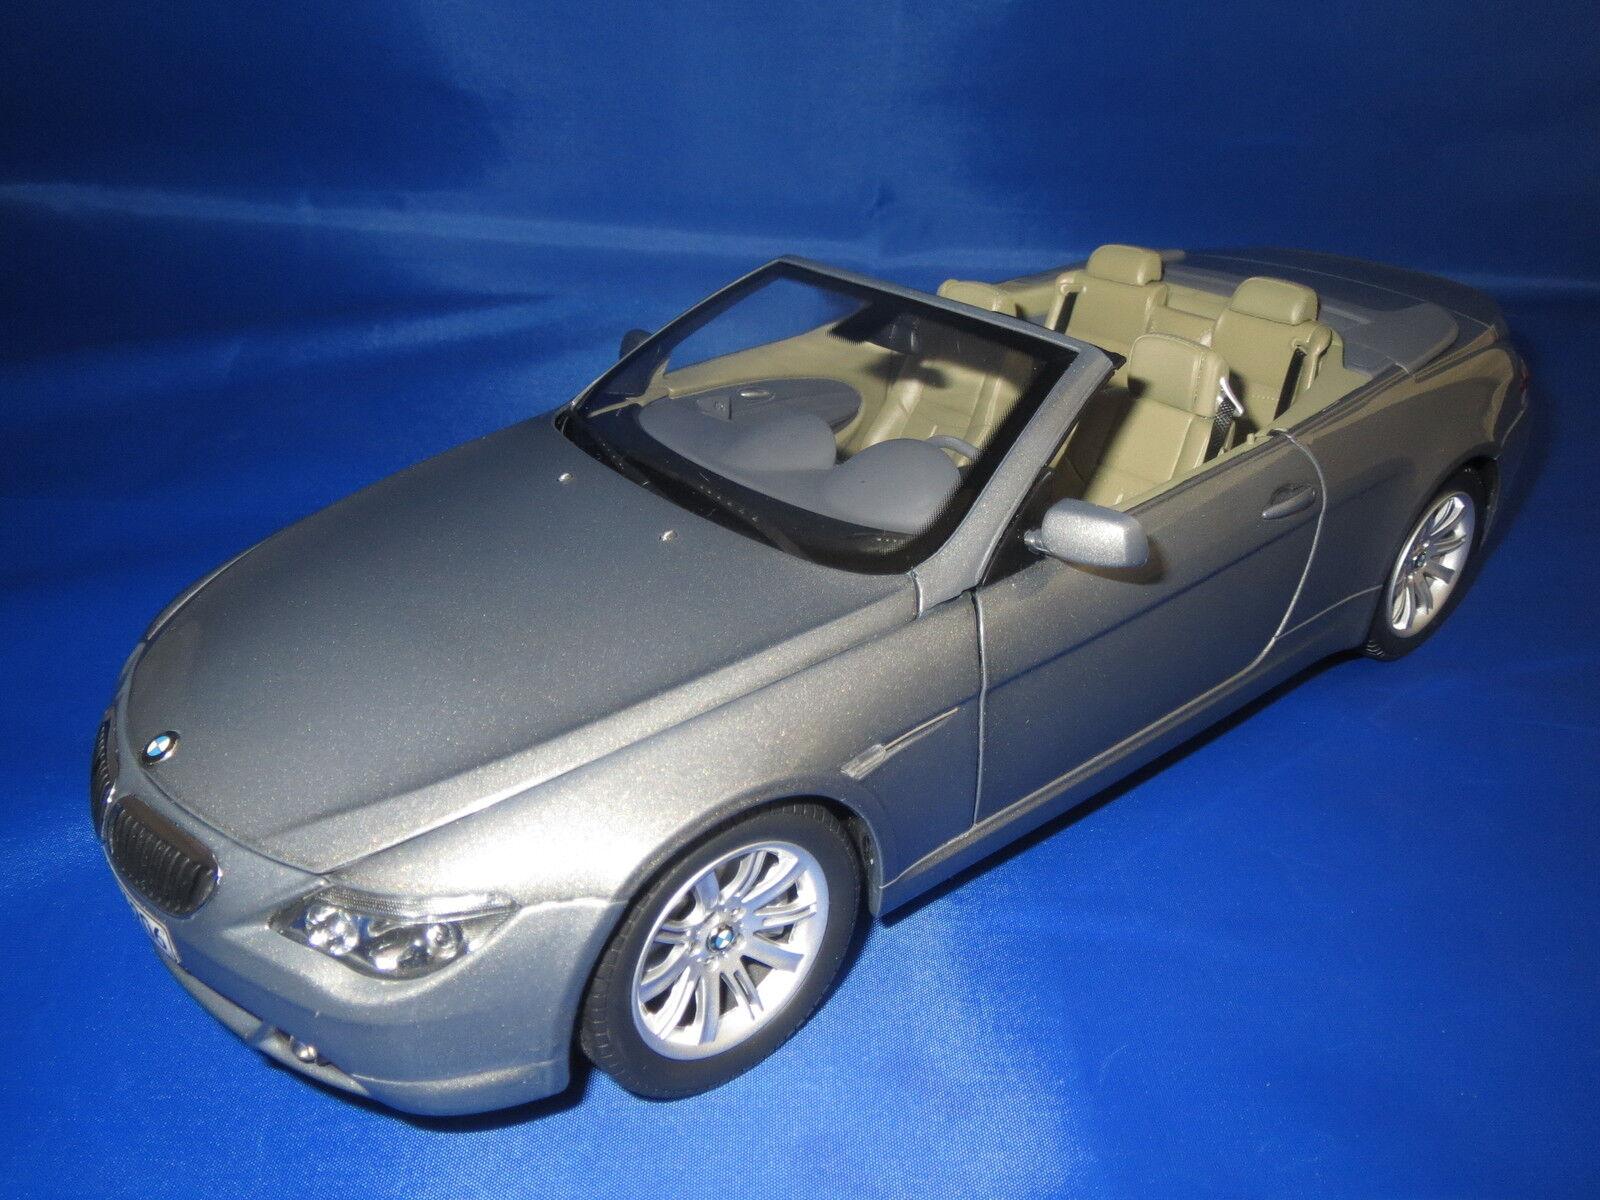 KYOSHO BMW 6er Cabrio Dealer version 80430153438 (Grigio-metallico) 1:18 OVP